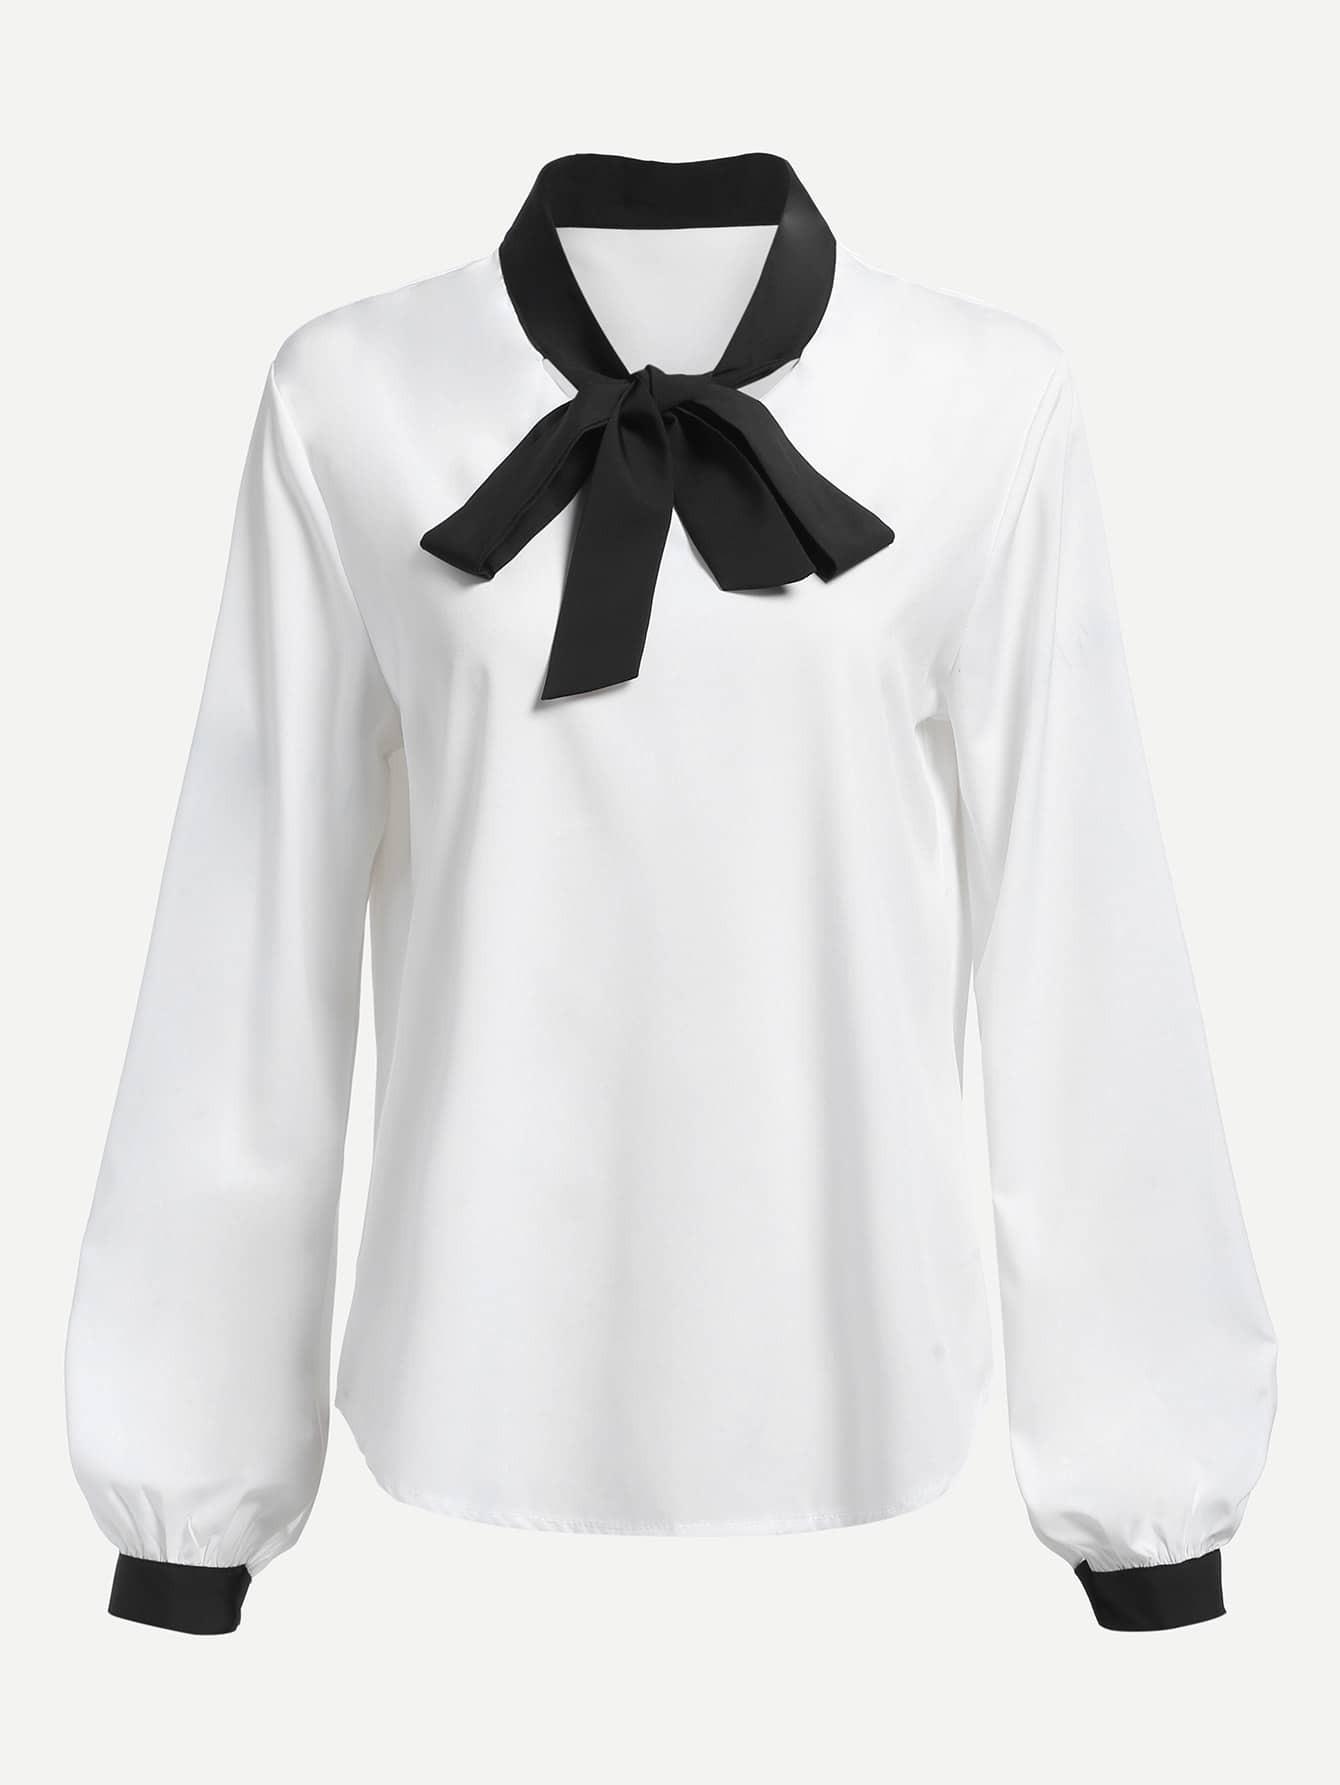 Купить Контраст Trim Tie Neck шифон блузка, null, SheIn